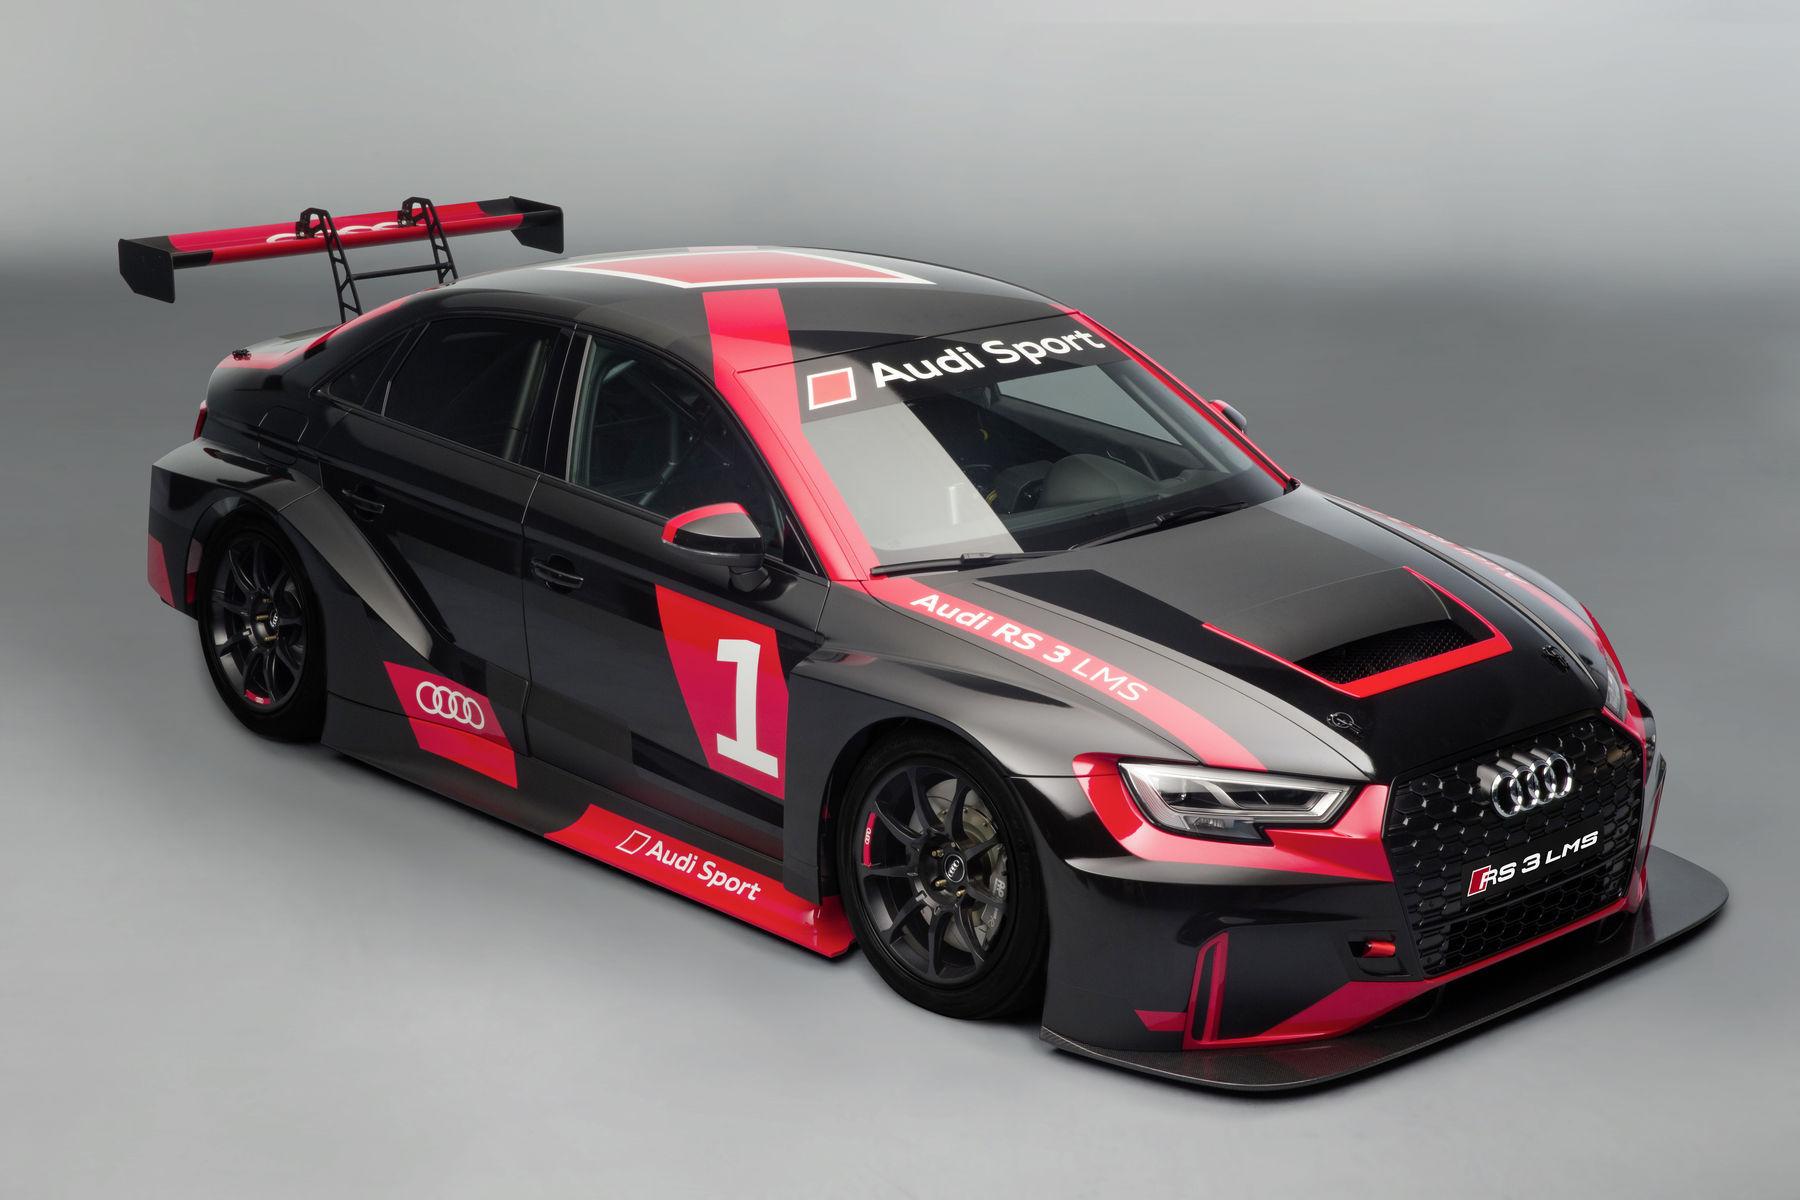 2017 Audi RS 3 | Audi RS3 LMS